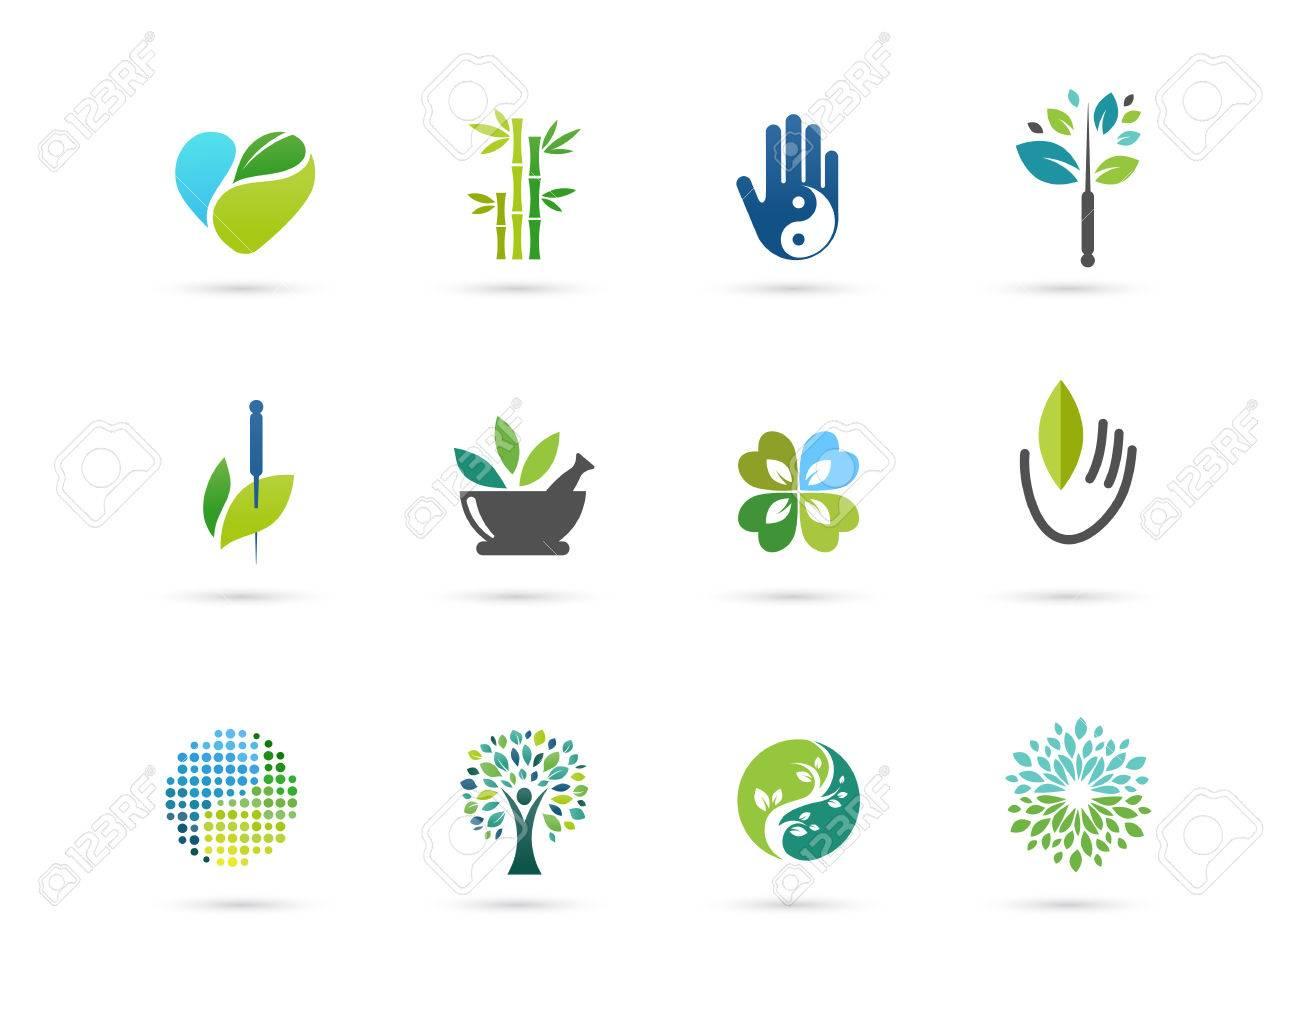 Alternative, Chinese medicine and wellness, yoga, zen meditation concept - vector icons, logos - 59738124